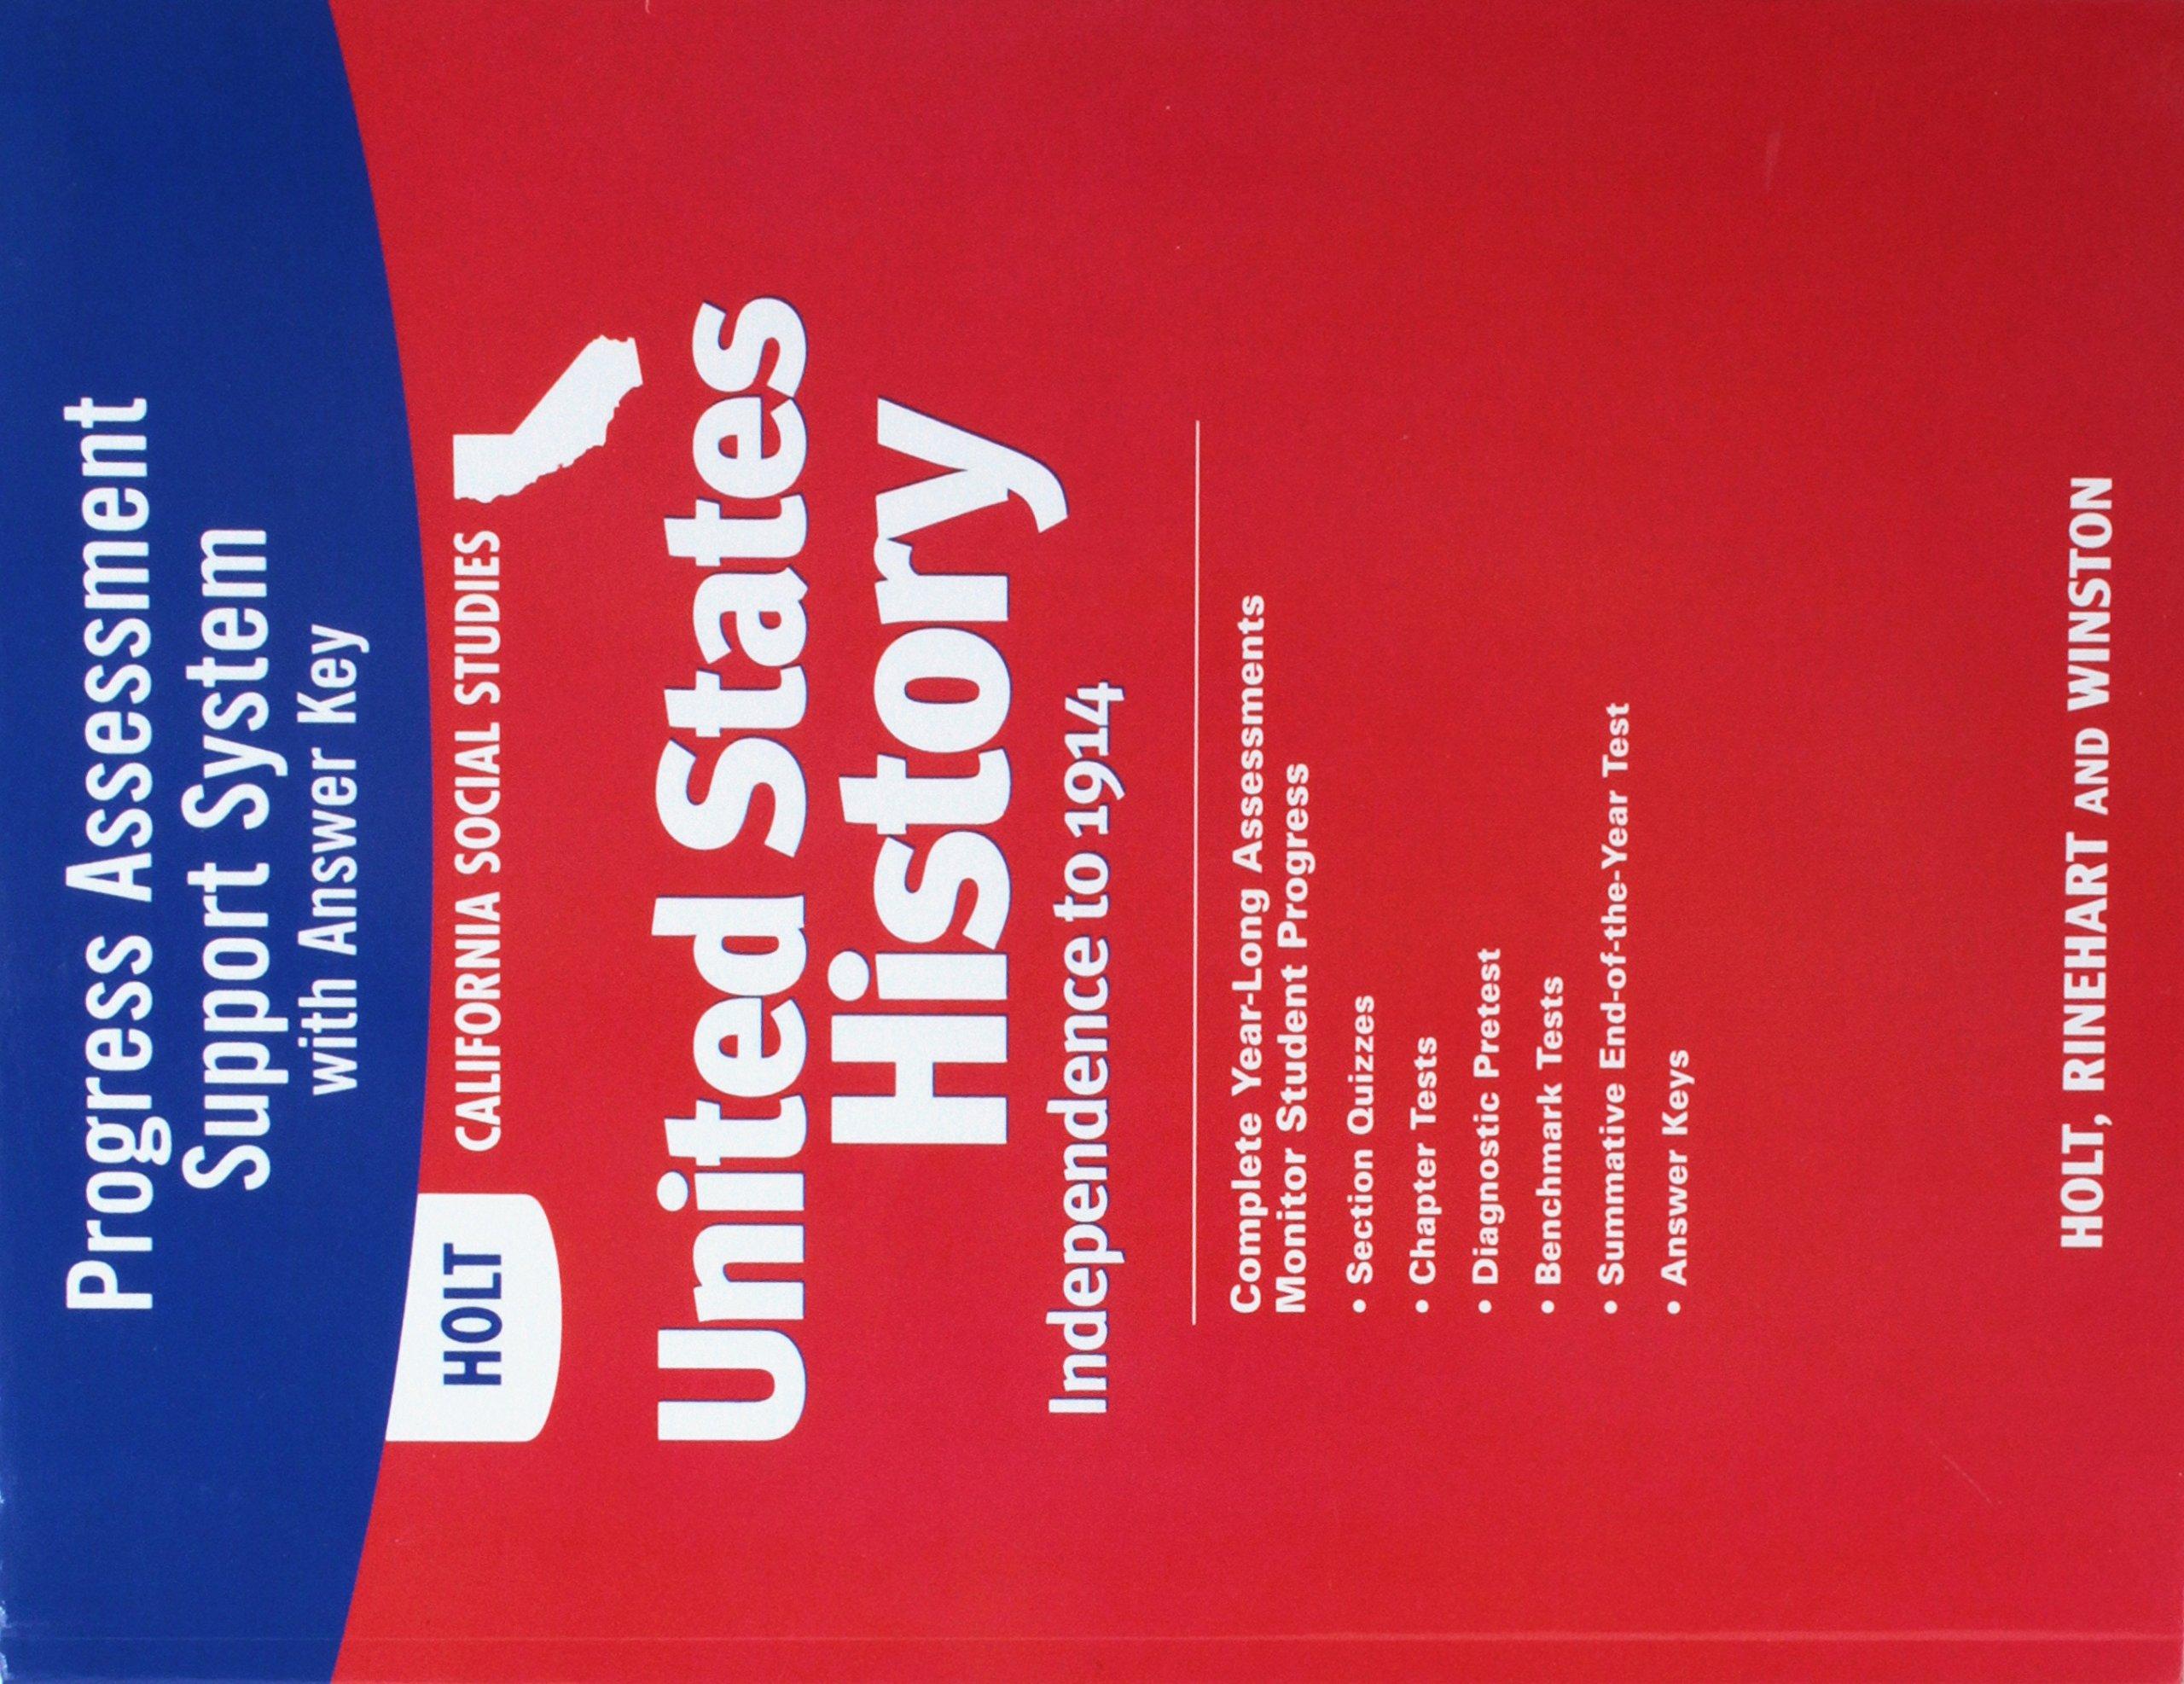 Holt United States History California: Program Assessment